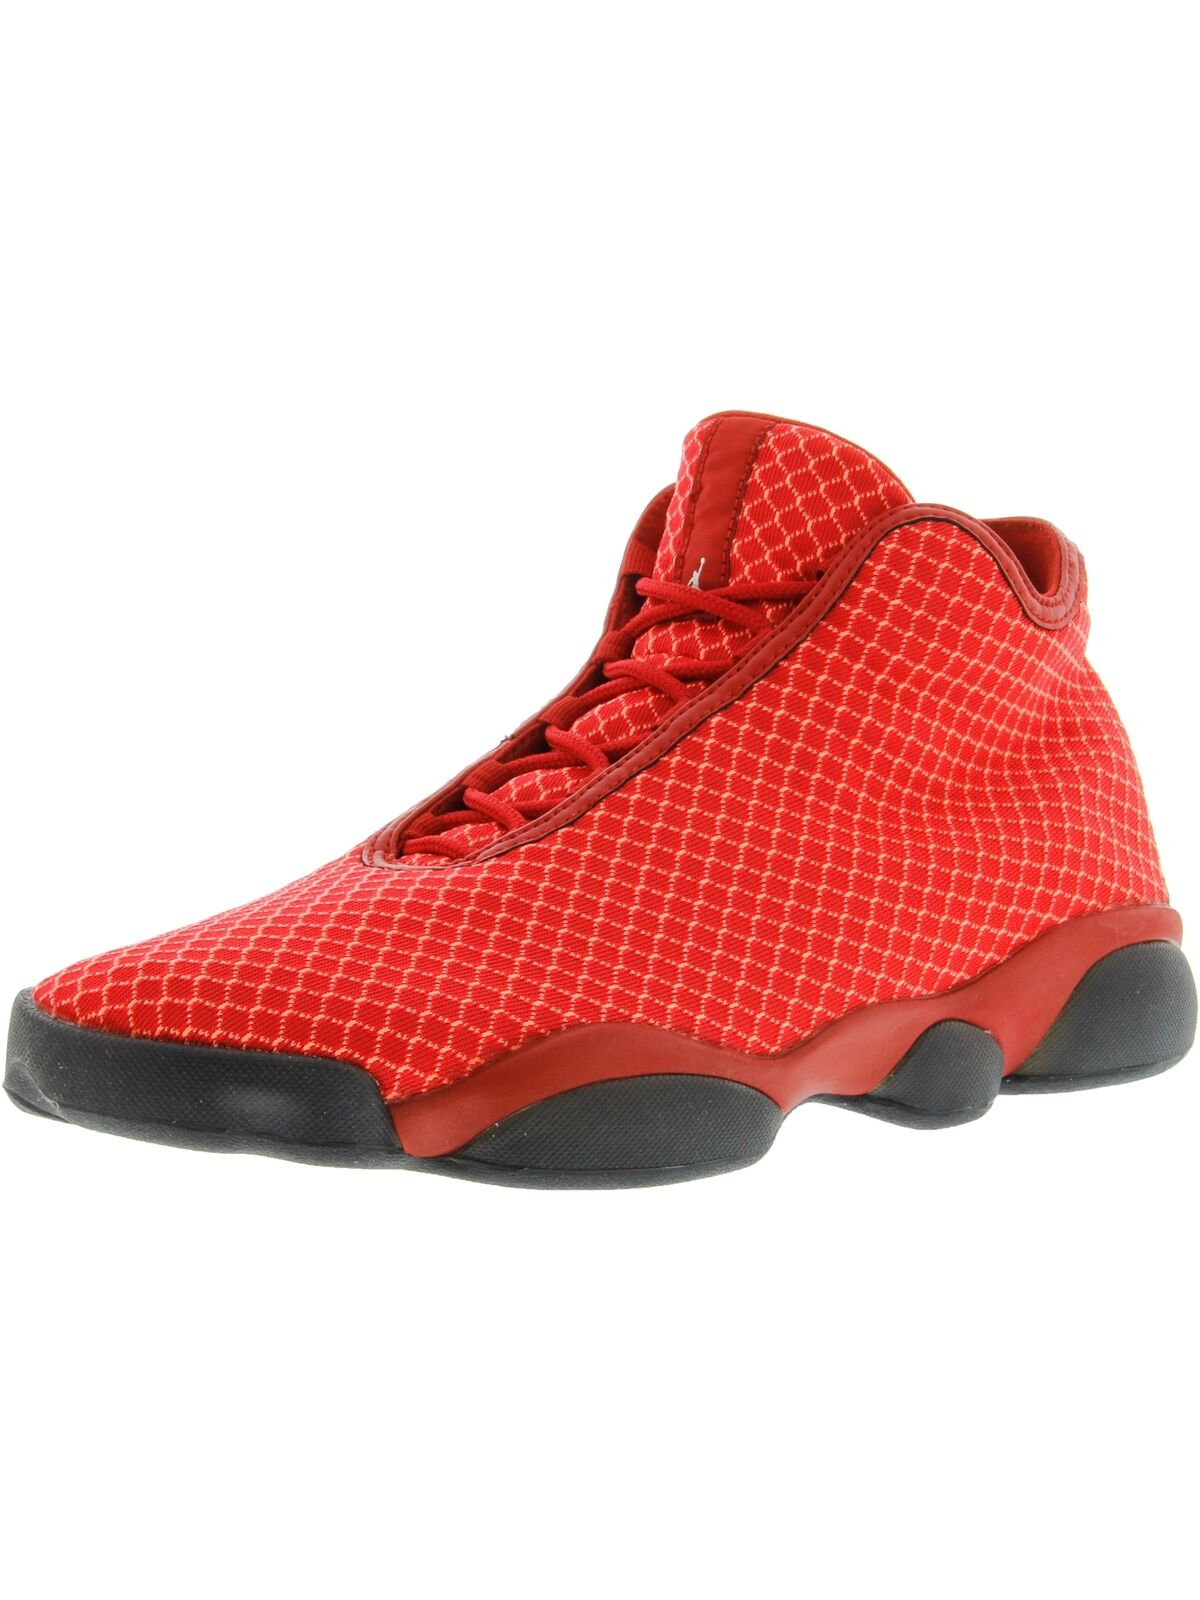 Nike Men's Jordan Horizon Ankle-High Fabric Basketball shoes